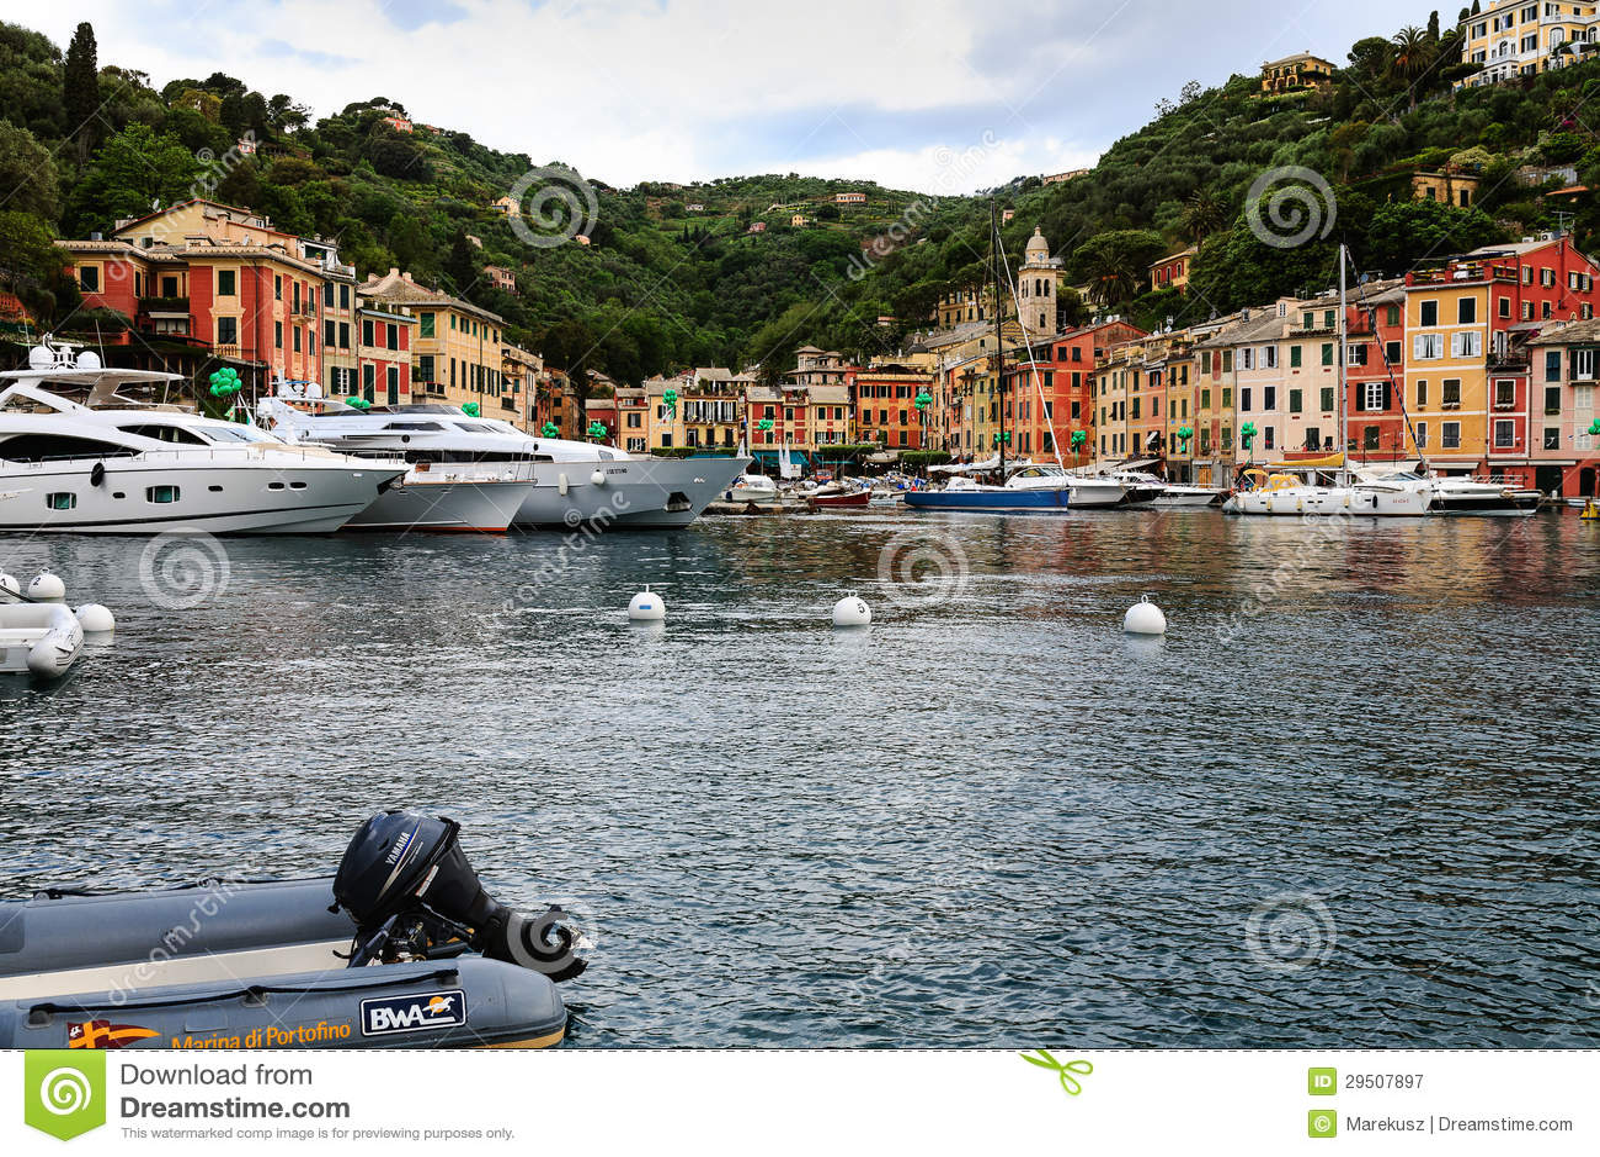 Jachthaven in Portofino